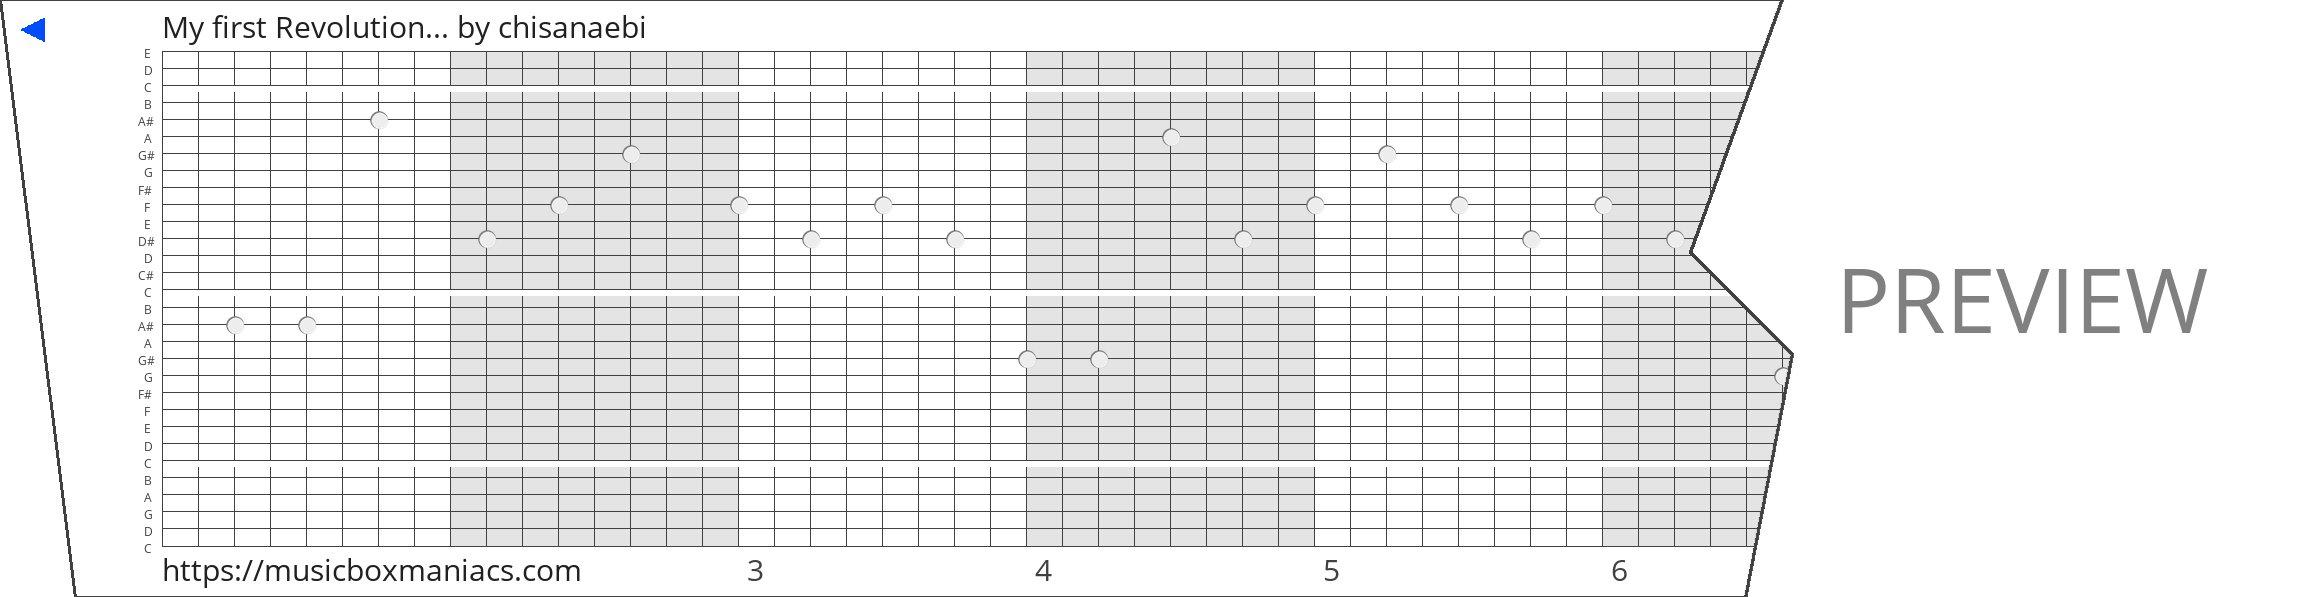 My first Revolution... 30 note music box paper strip